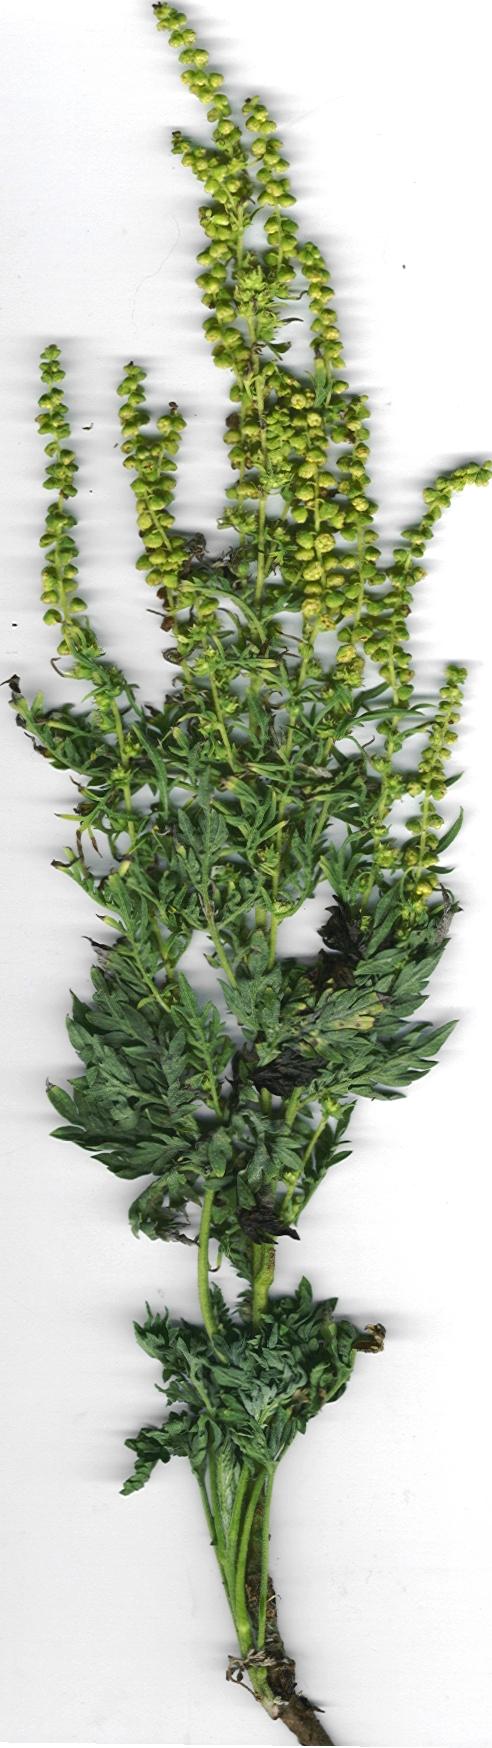 Bild: Forest & Kim Starr. Lizenz: CC-BY-3.0 https://i2.wp.com/upload.wikimedia.org/wikipedia/commons/3/33/Starr_010222-9001_Ambrosia_artemisiifolia.jpg